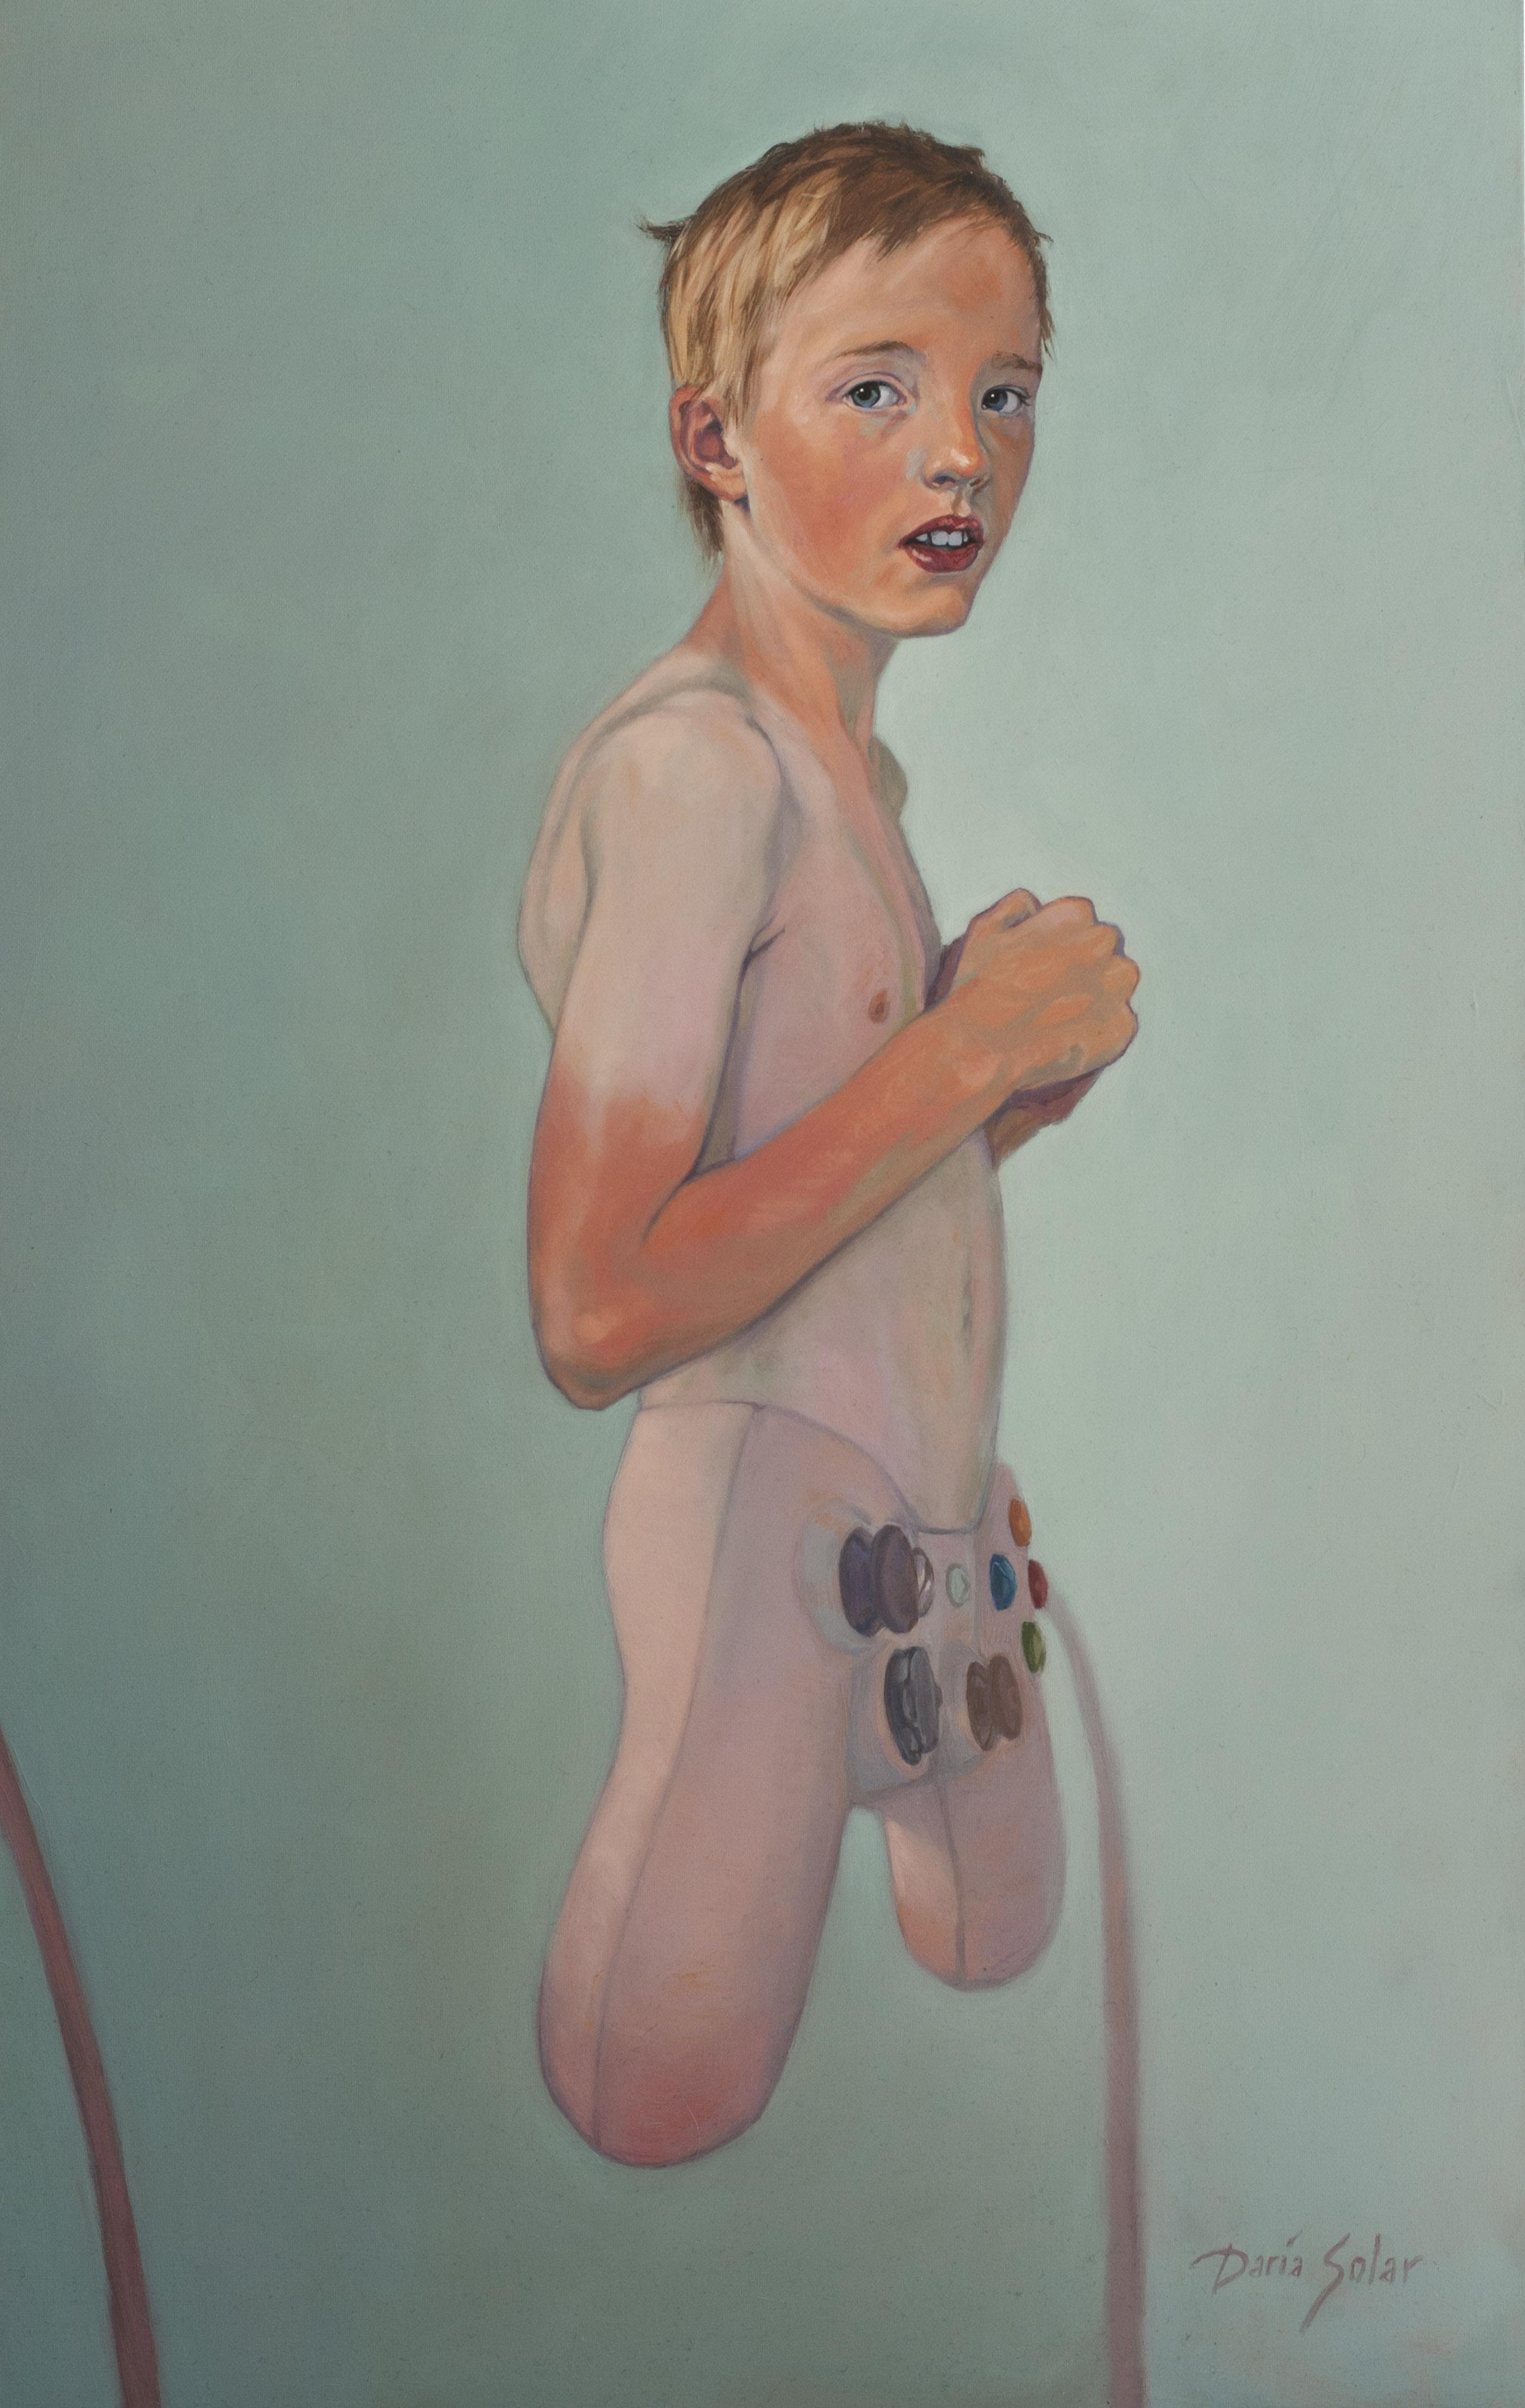 VIRTUAL BOY - Art against Paedophilia